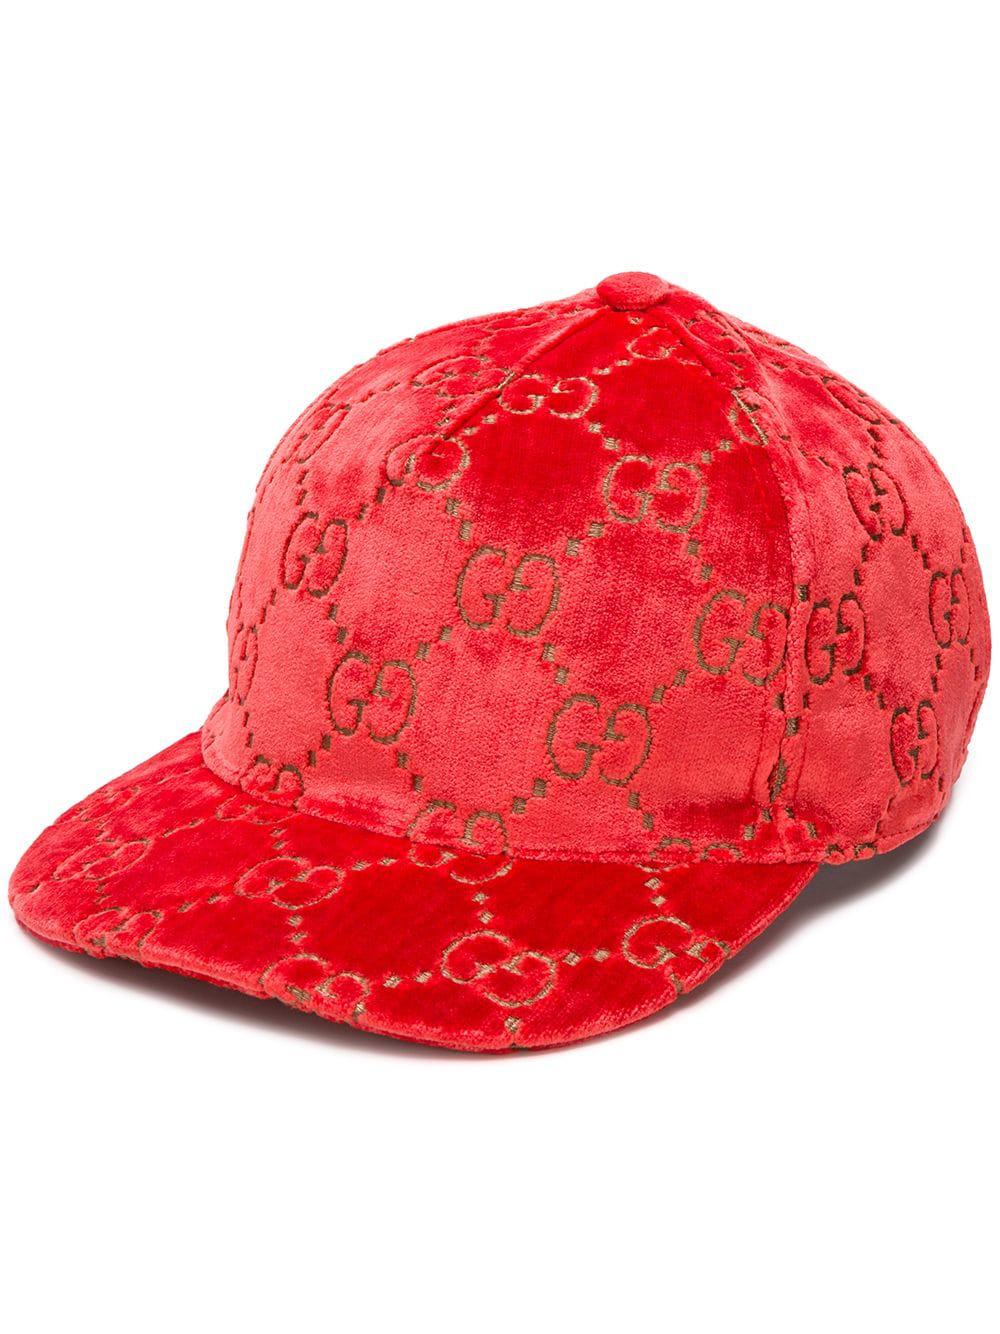 b454b948150 Gucci Metallic Velvet-Jacquard Baseball Cap In Red